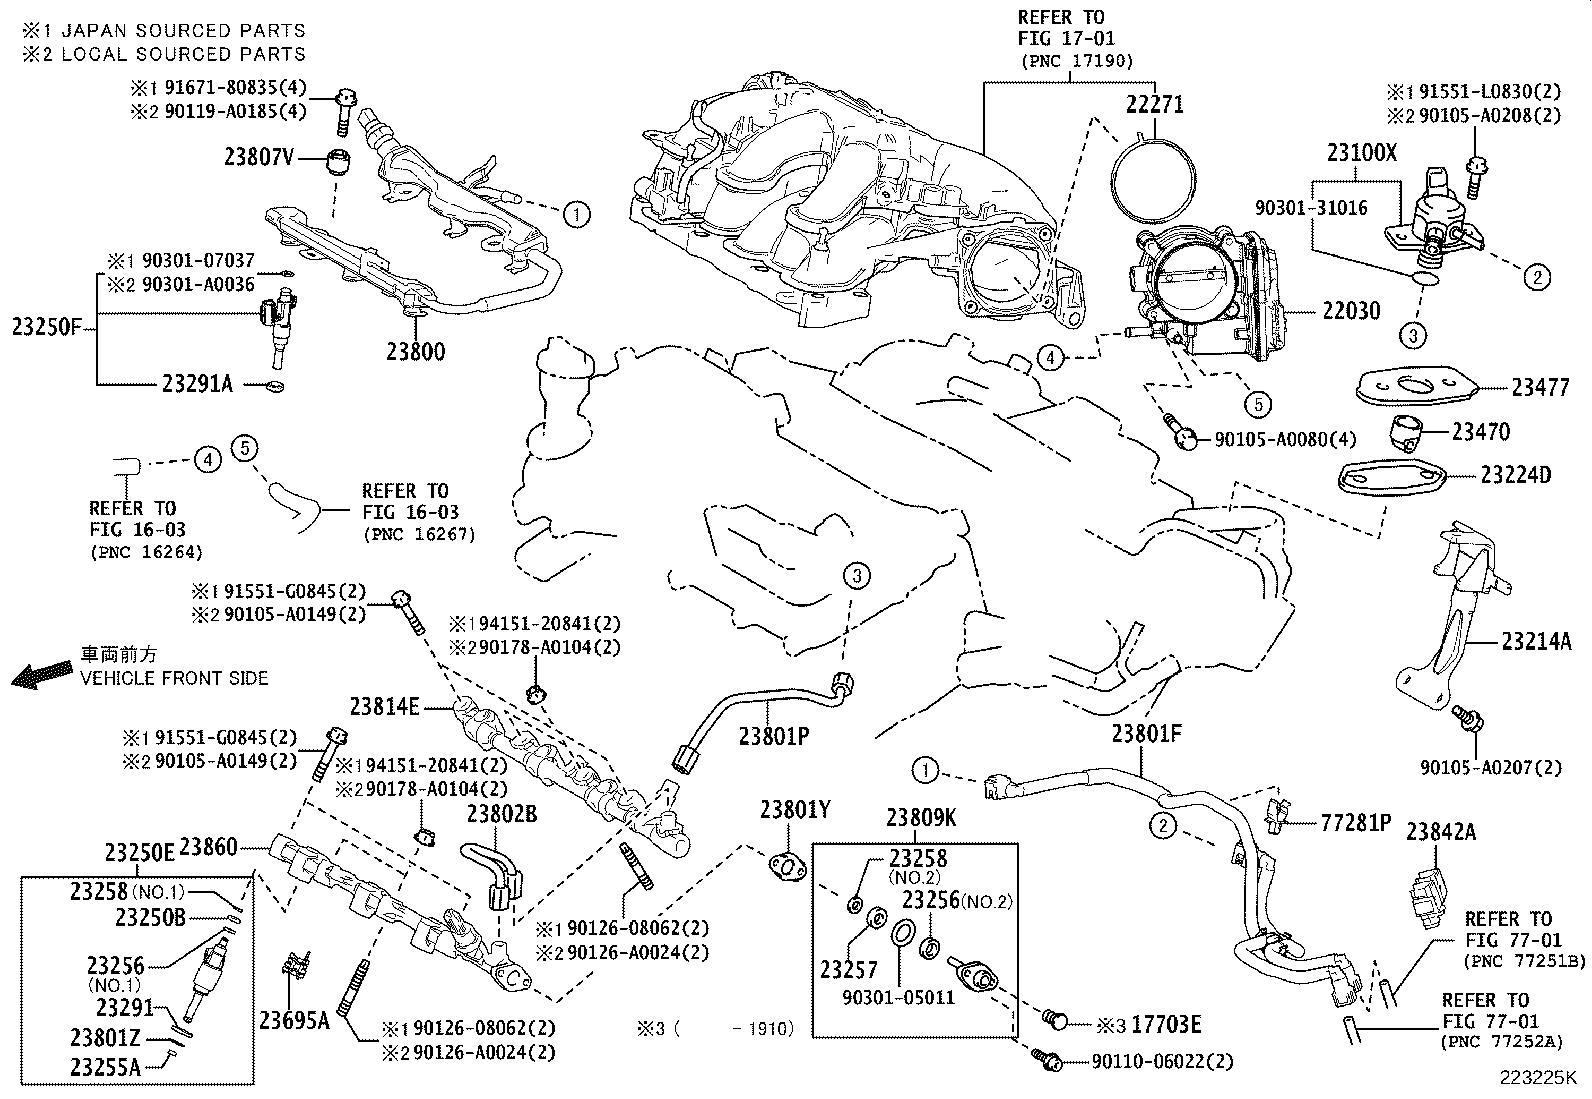 Lexus Rx 350 Fuel Injector  Injector Set  Fuel  Injector  Fuel  For Port